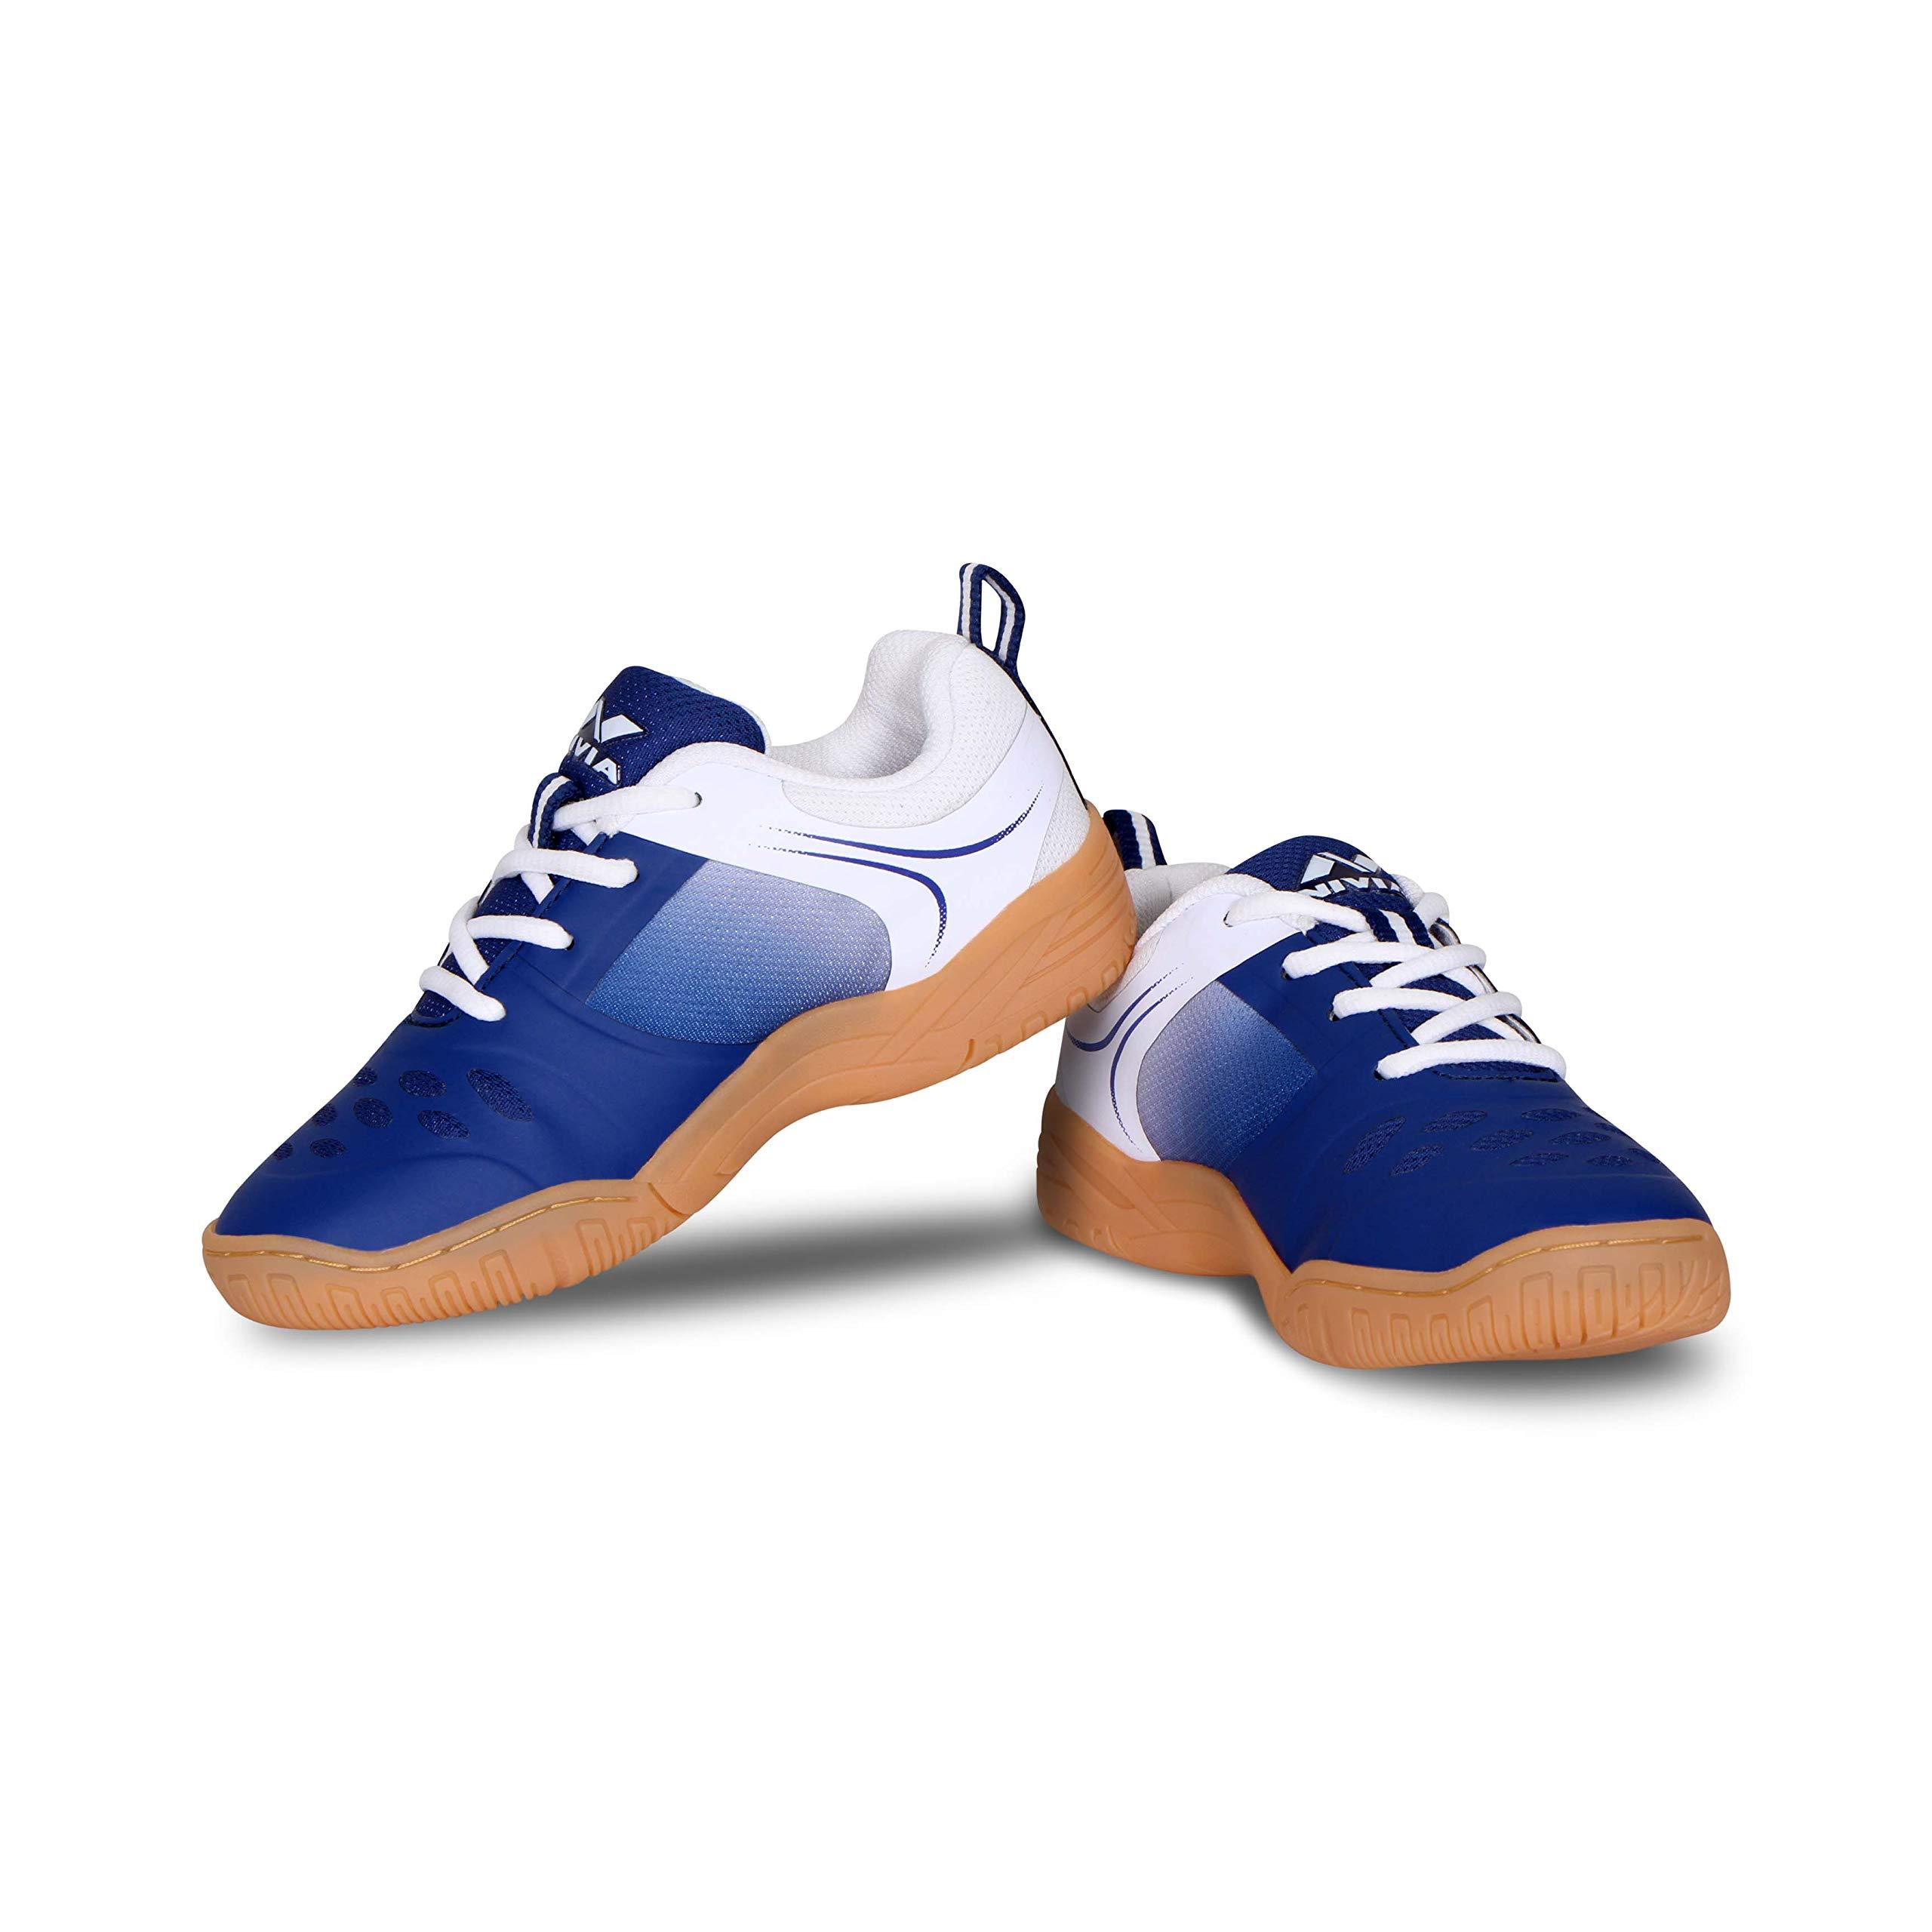 HY-Court Kids 2.0 Badminton Shoe (B07W3D34LD) Amazon Price History, Amazon Price Tracker